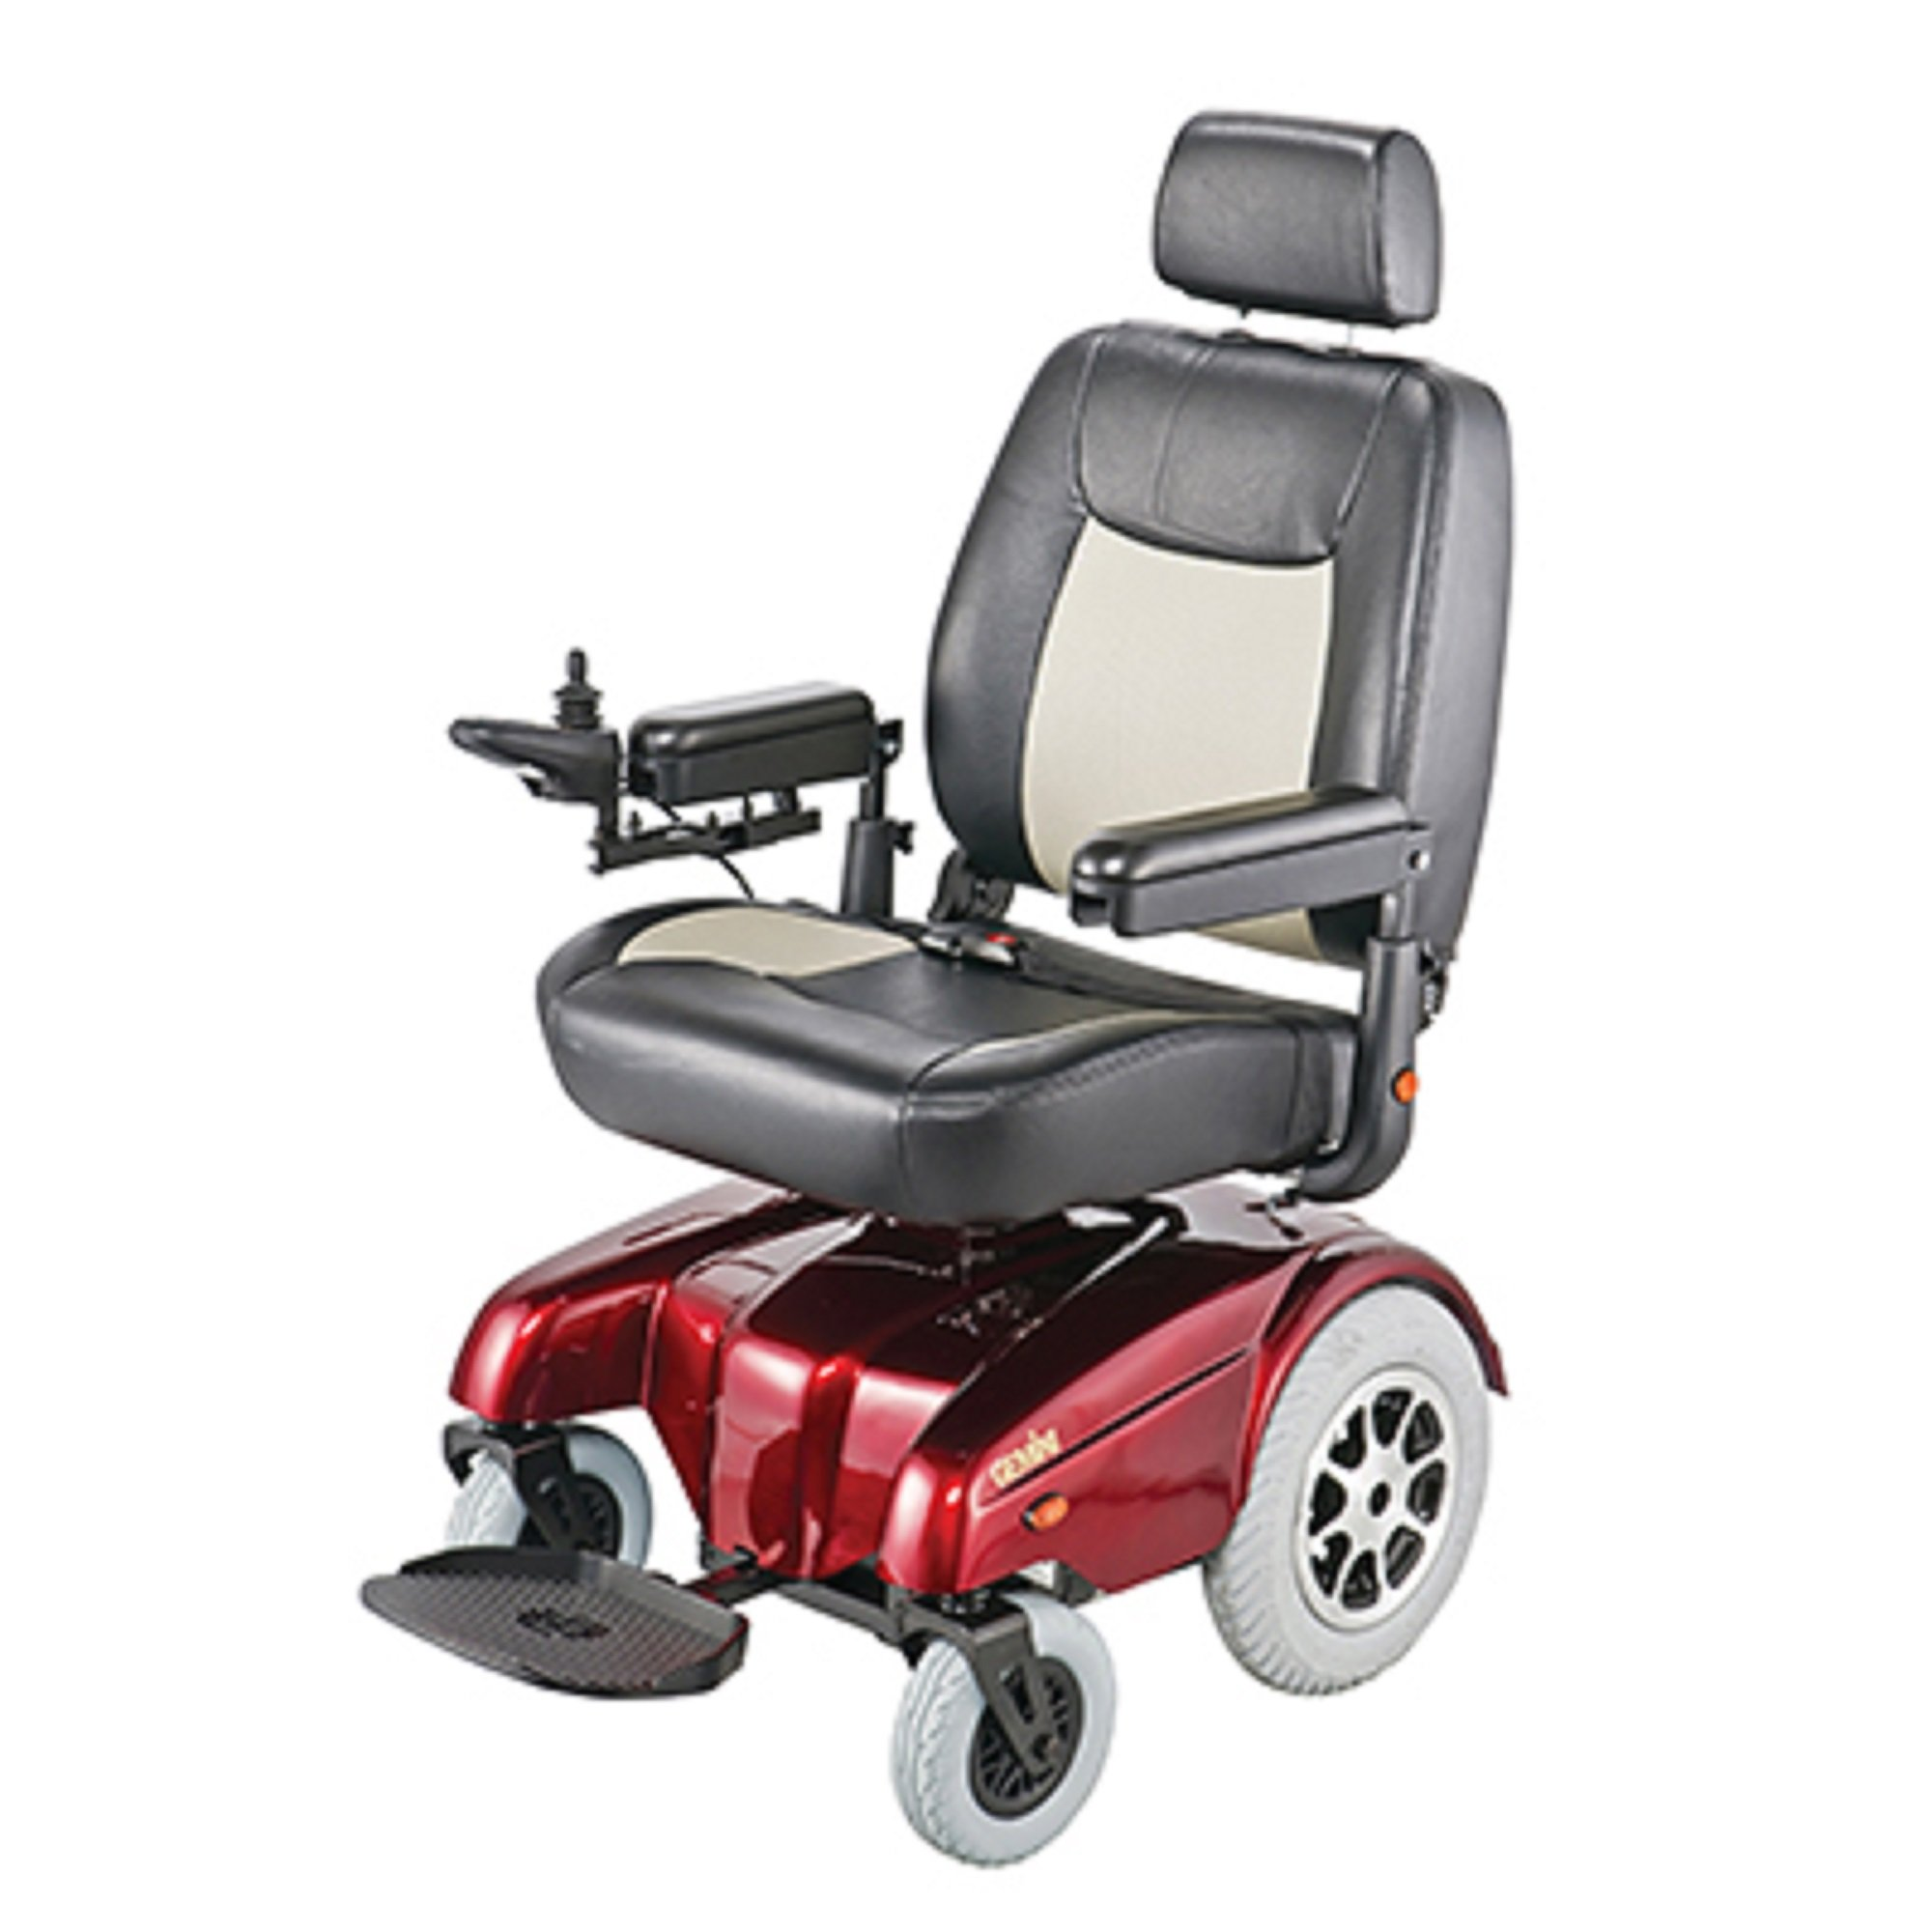 Merits Health Products - Gemini - Heavy Duty Rear Wheel Drive Power Chair - 22''W x 20''D - Red